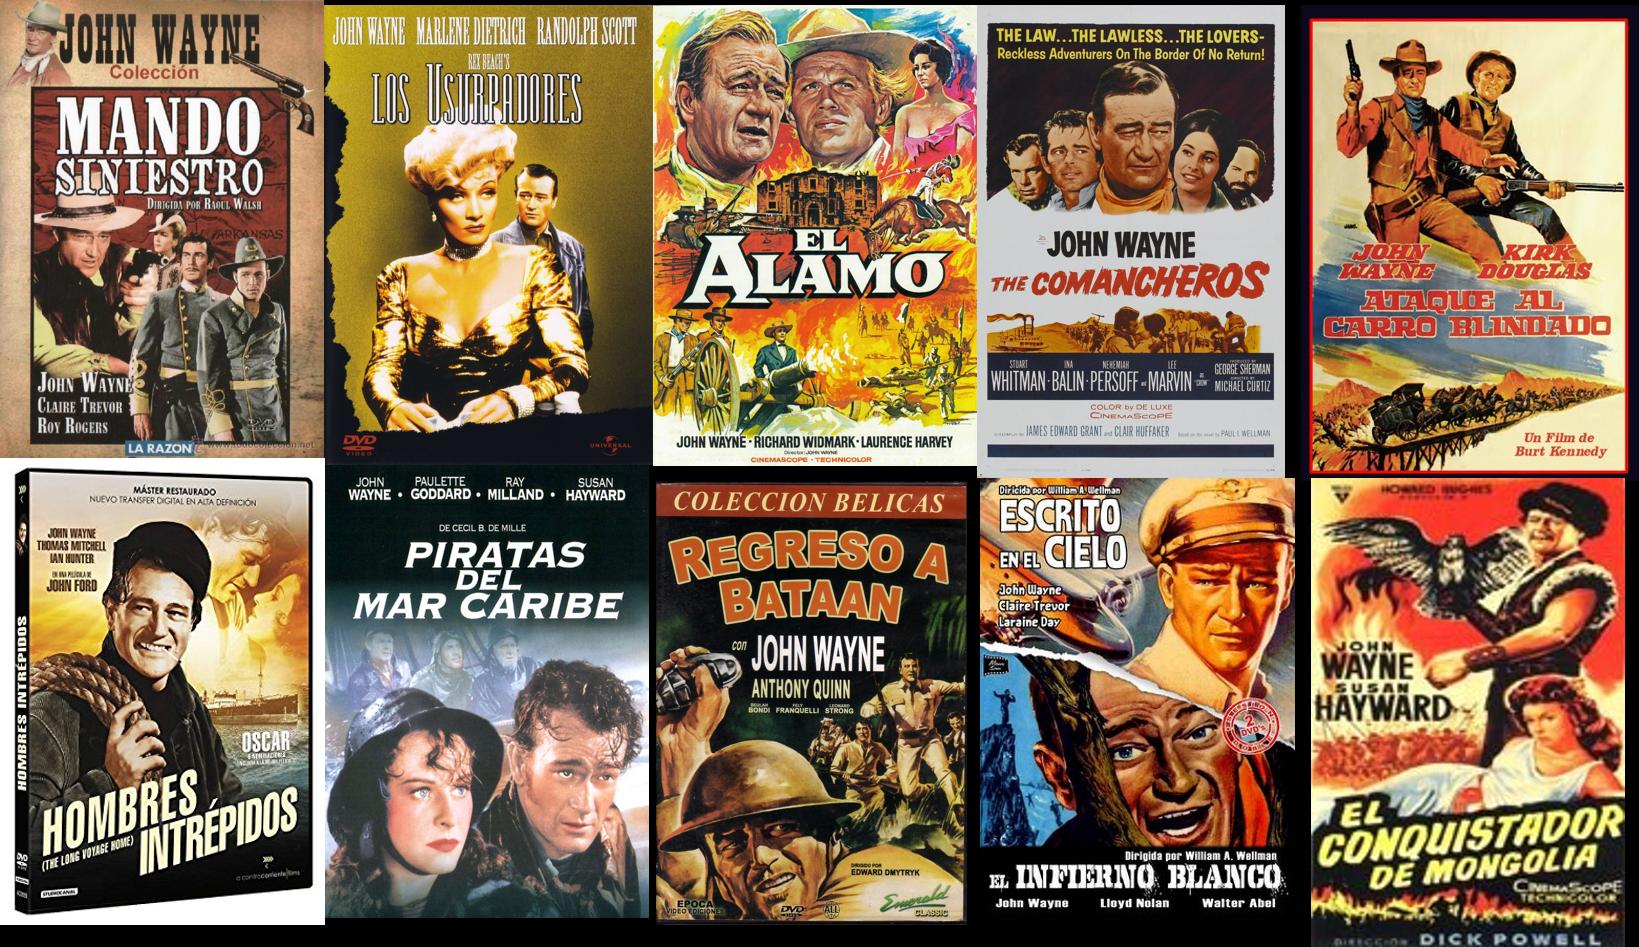 John Wayne afiches 4